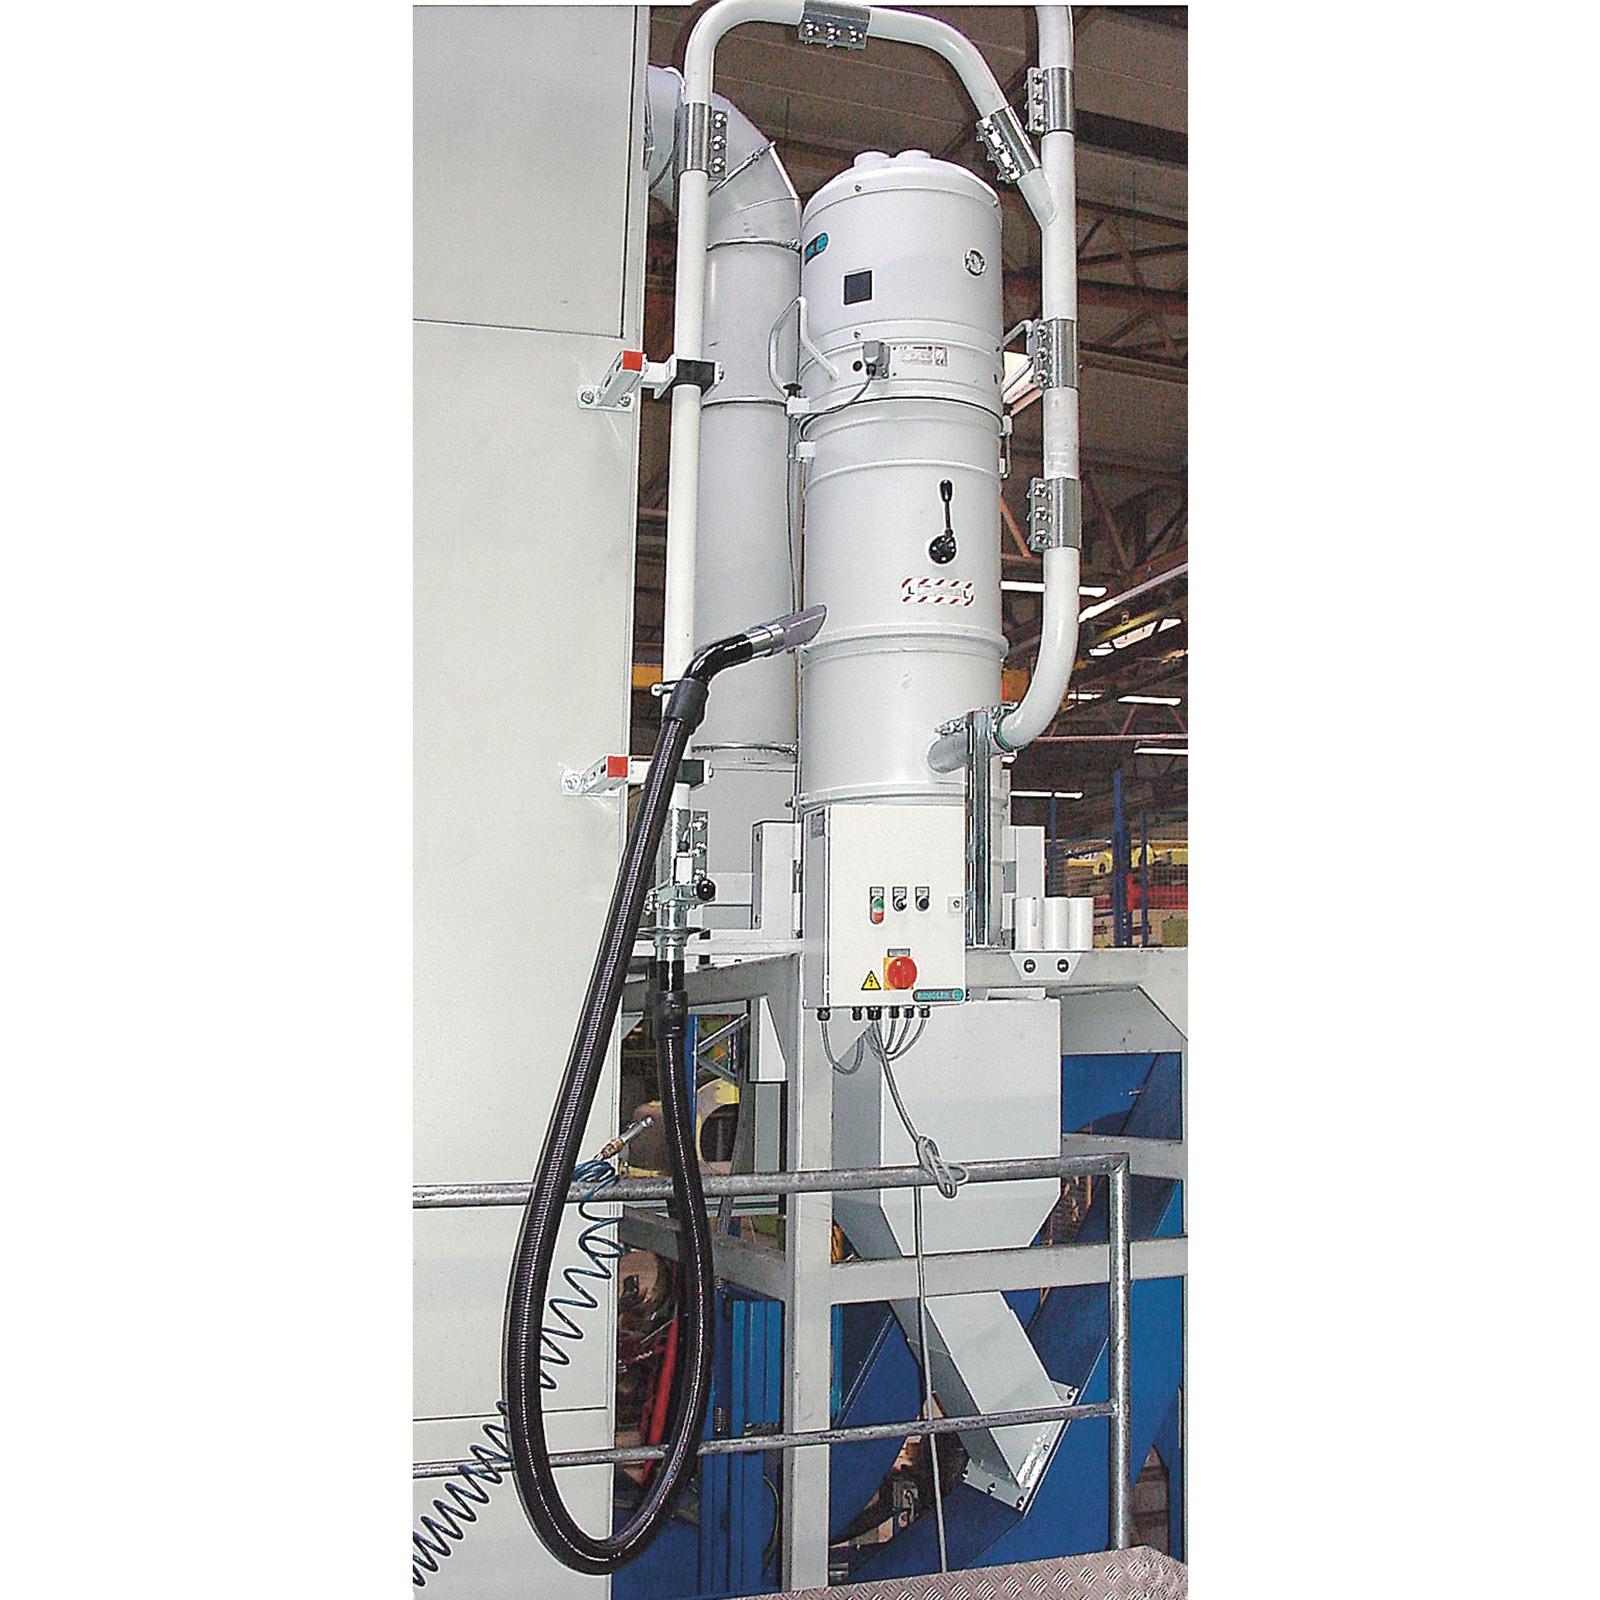 liquid and swarf vacuums ri 751 d 3 0 equipment type 1 with manually rh ringler gmbh de Manual Car Manually Put On Paper